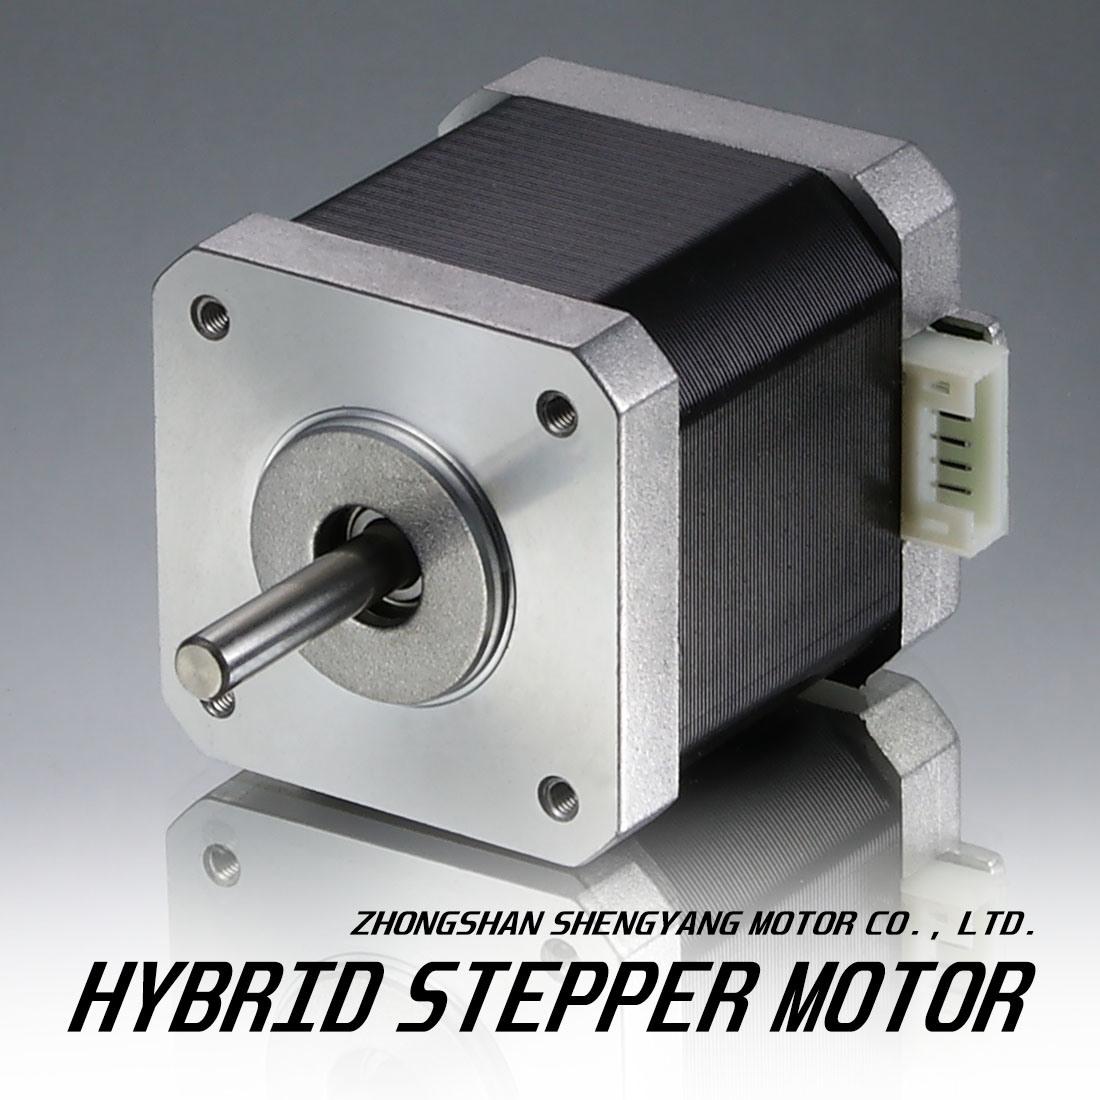 NEMA 34 86mm High Accuracy Stepper Motor for CNC, Printers